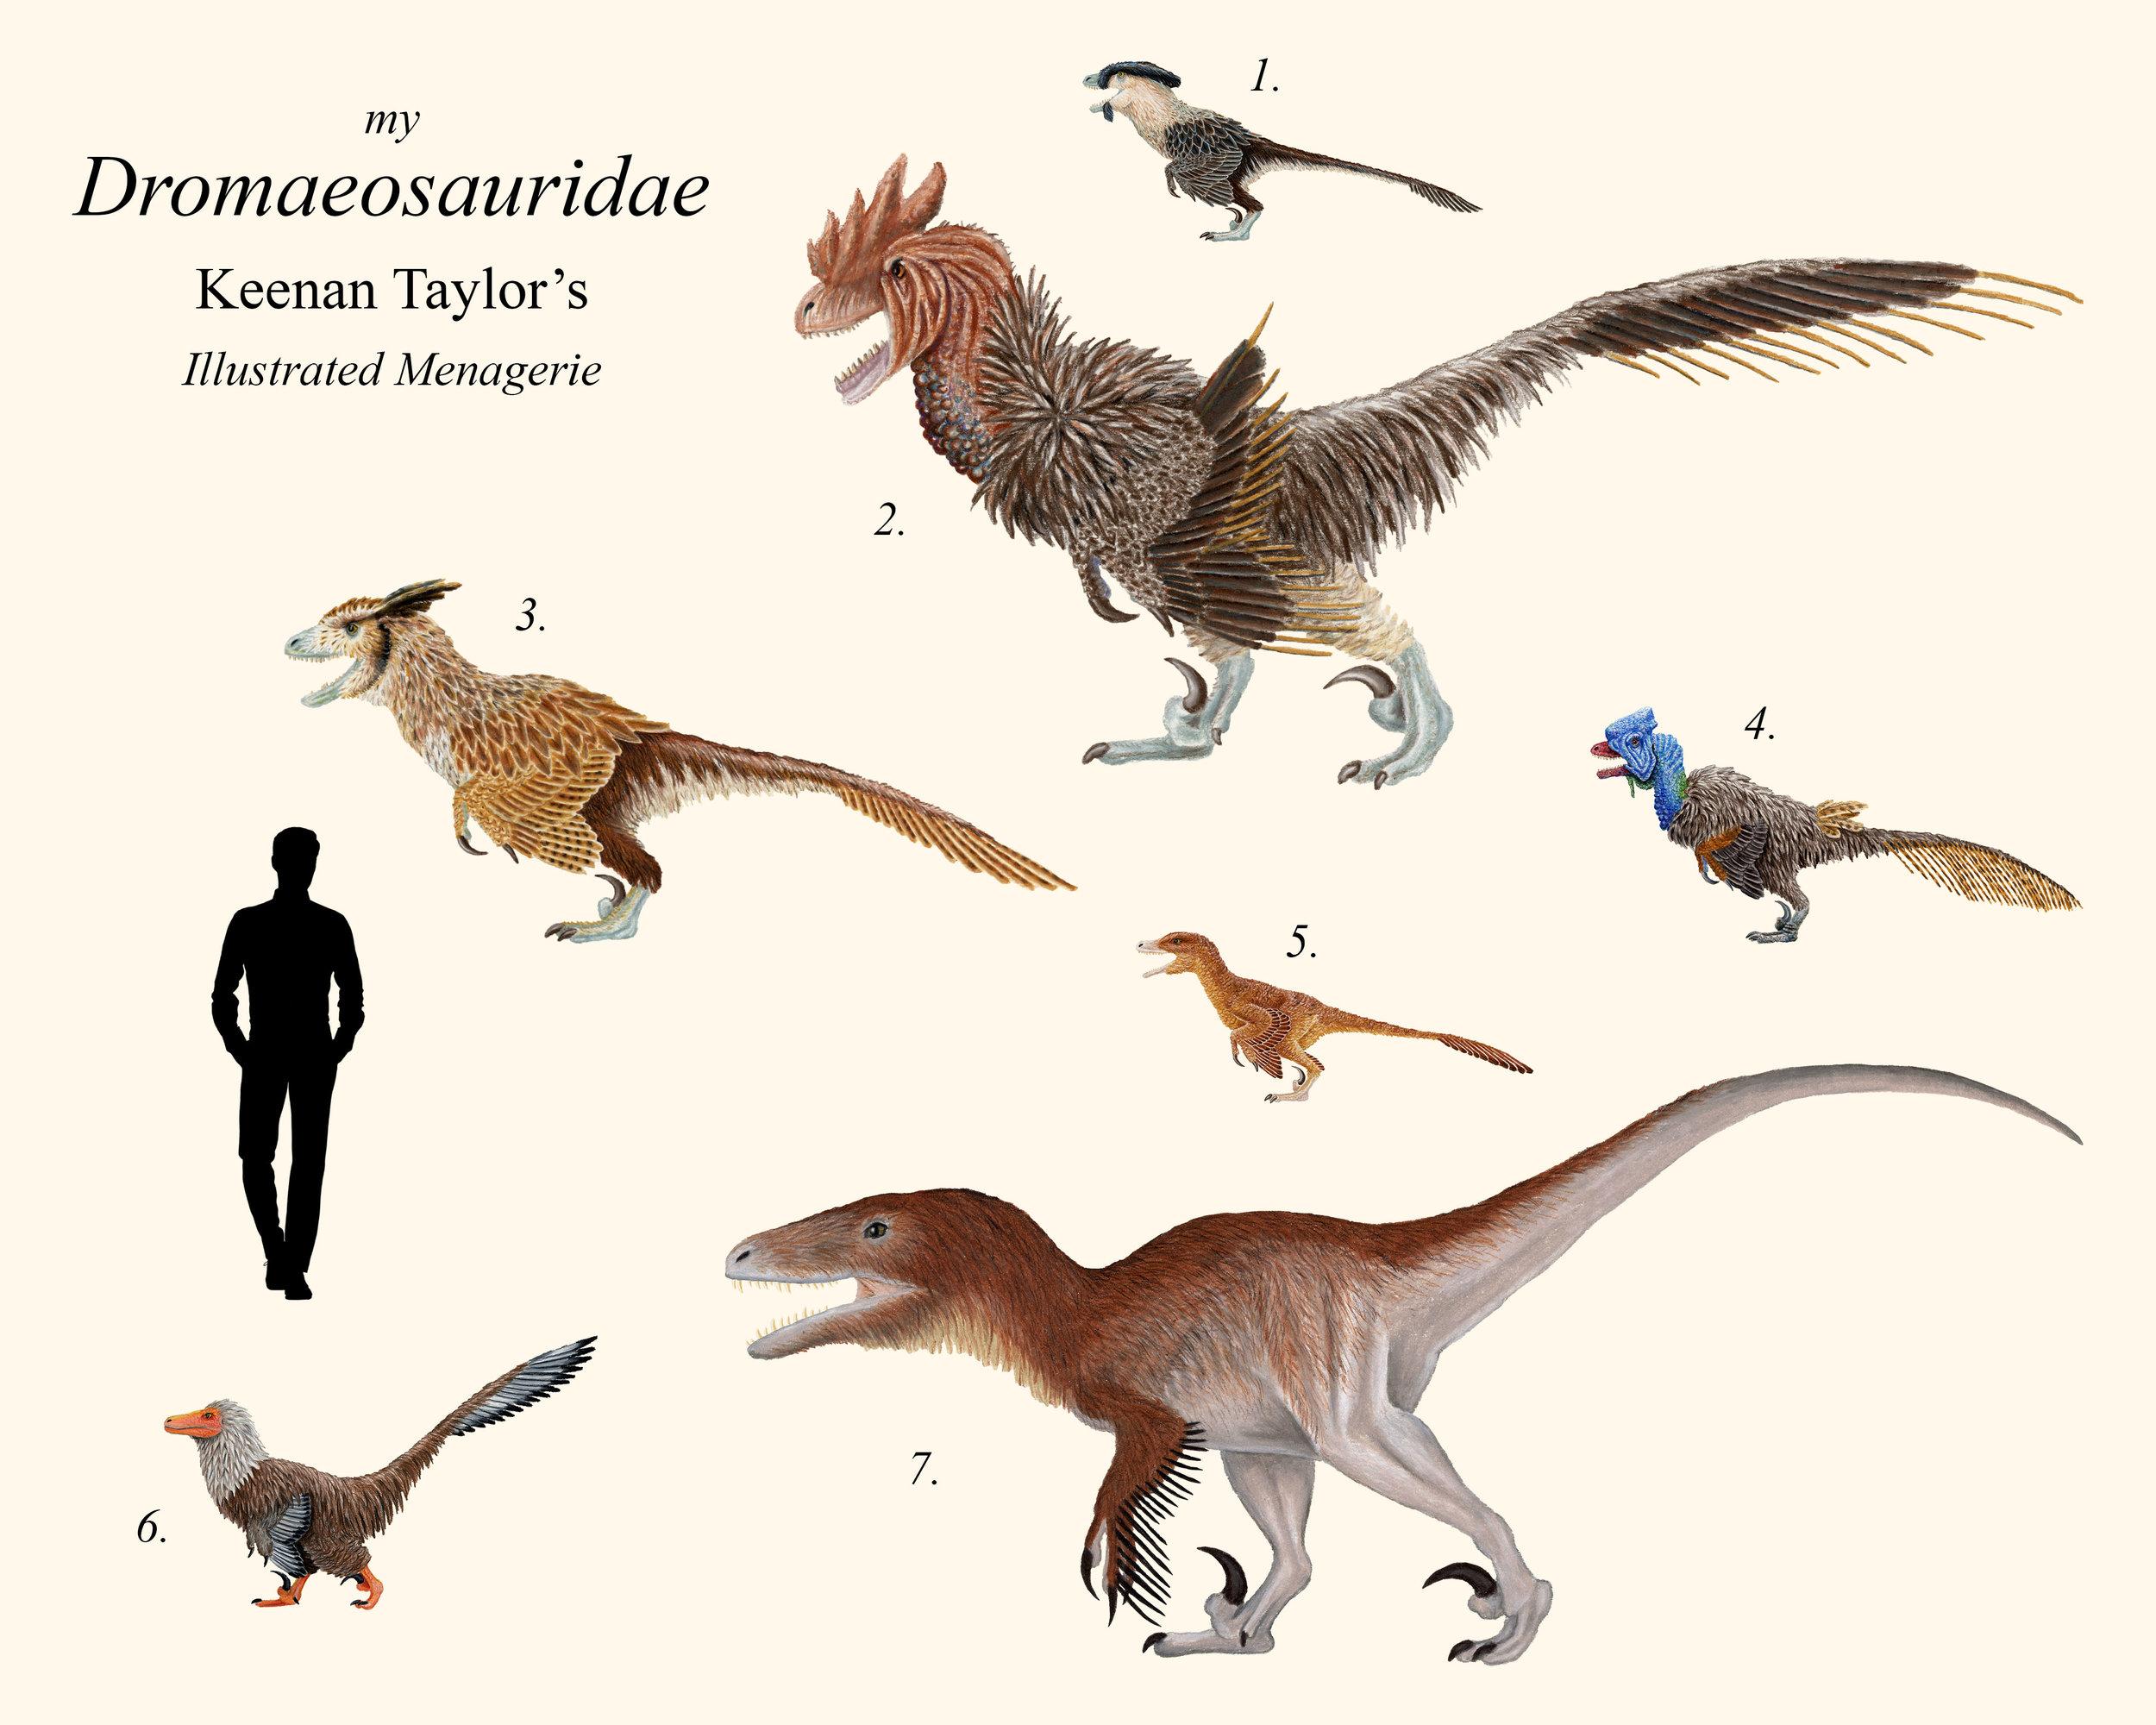 My Dromaeosauridae